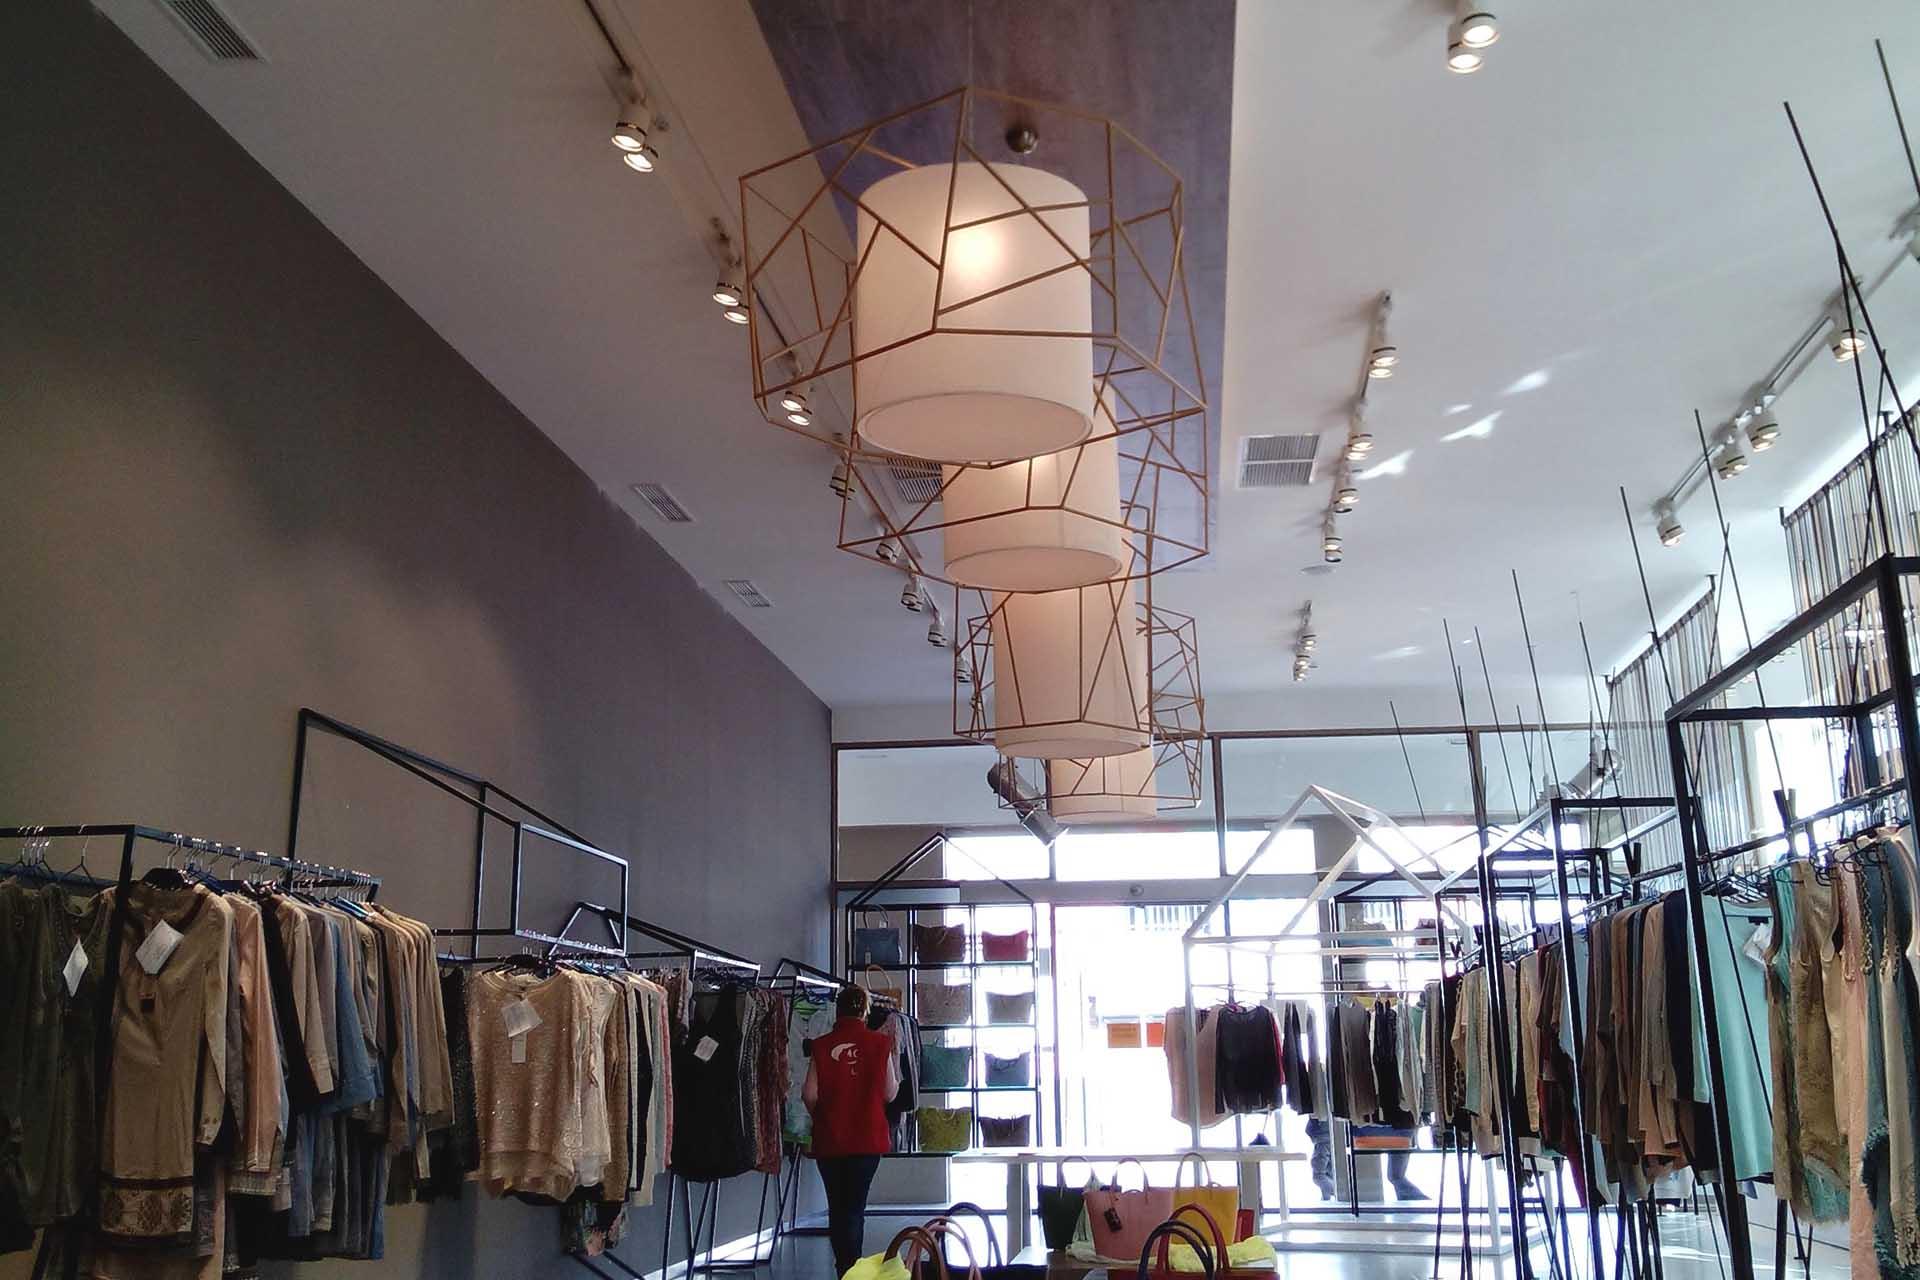 shopping-2-1-1-1.jpg